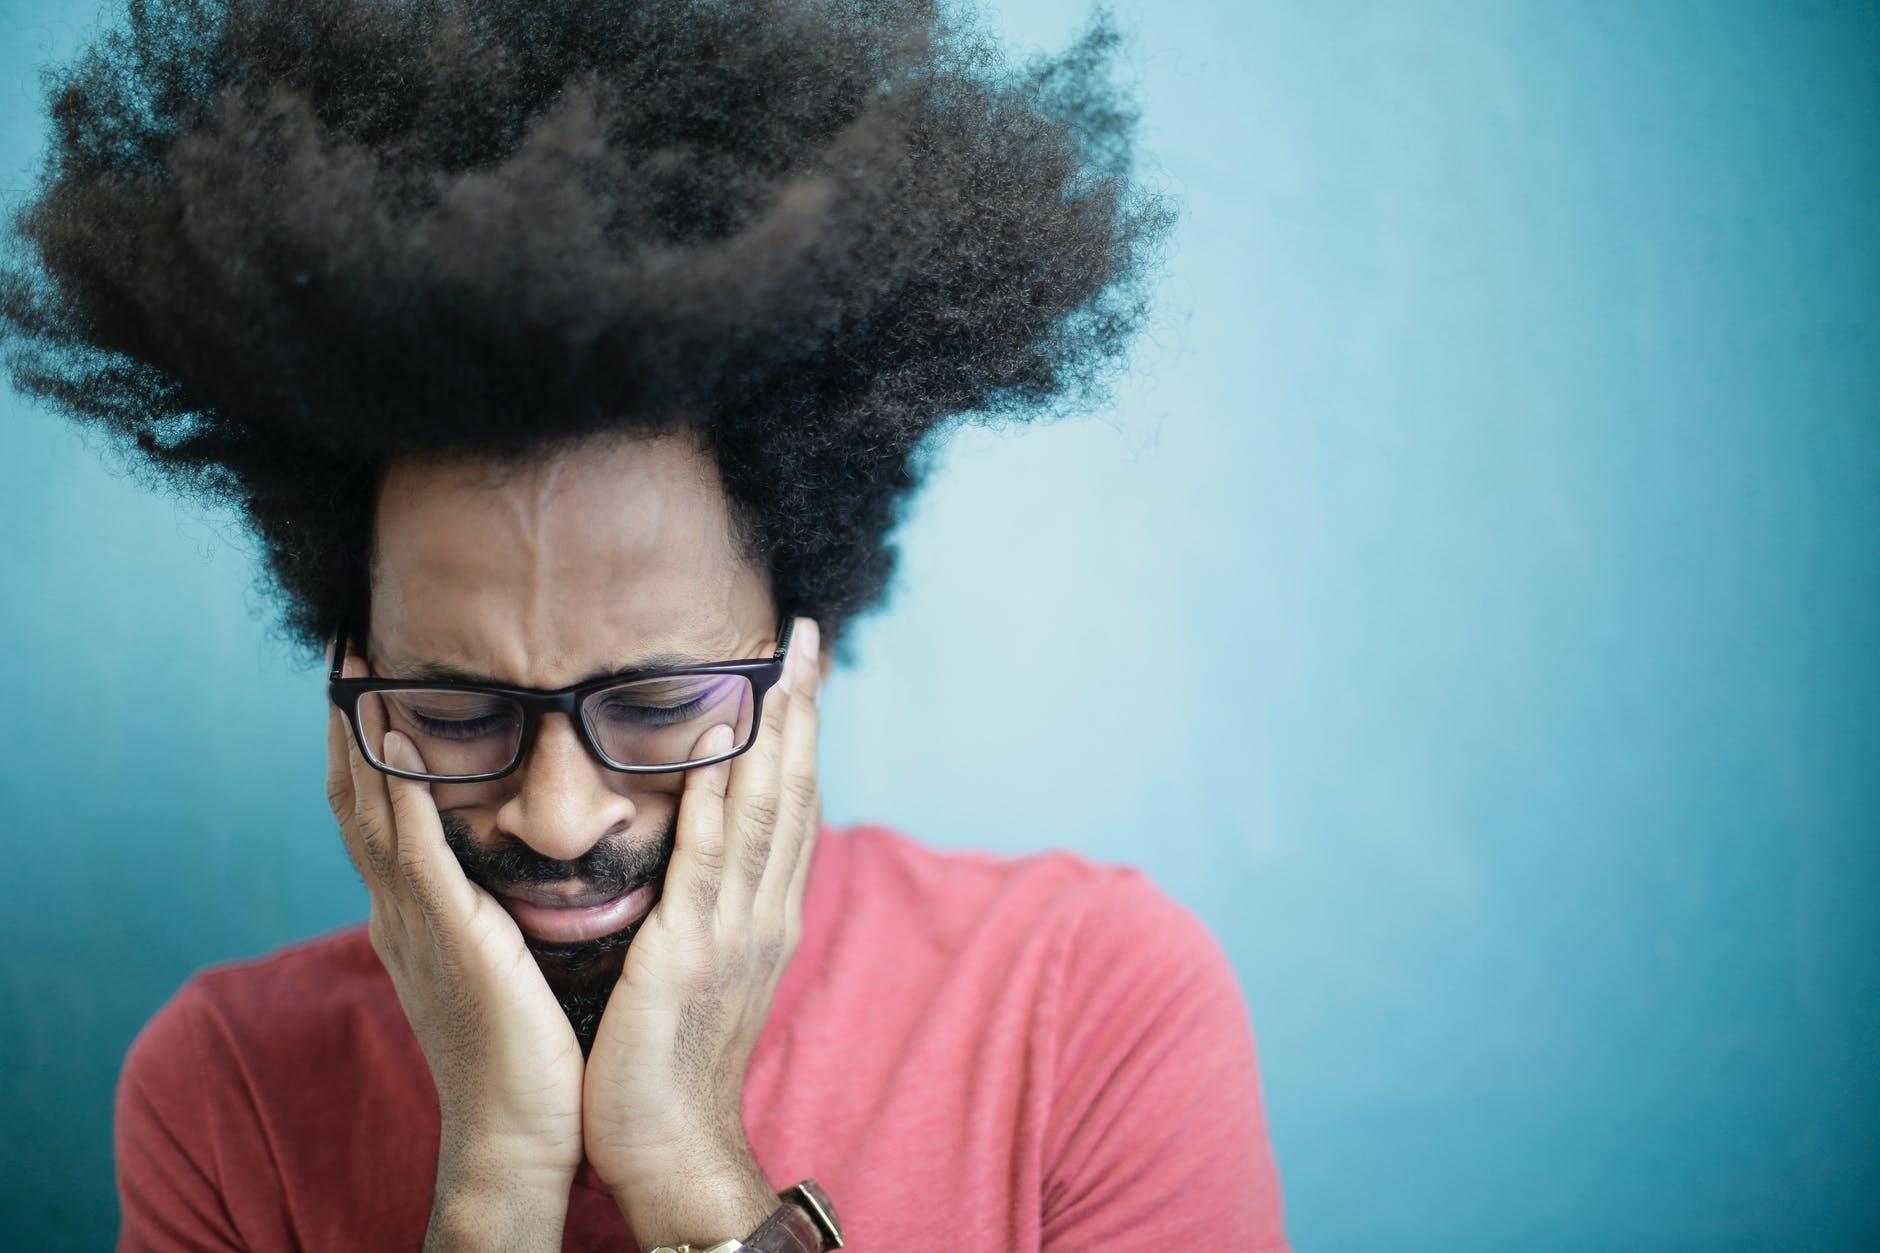 man in red crew neck shirt wearing black framed eyeglasses crying